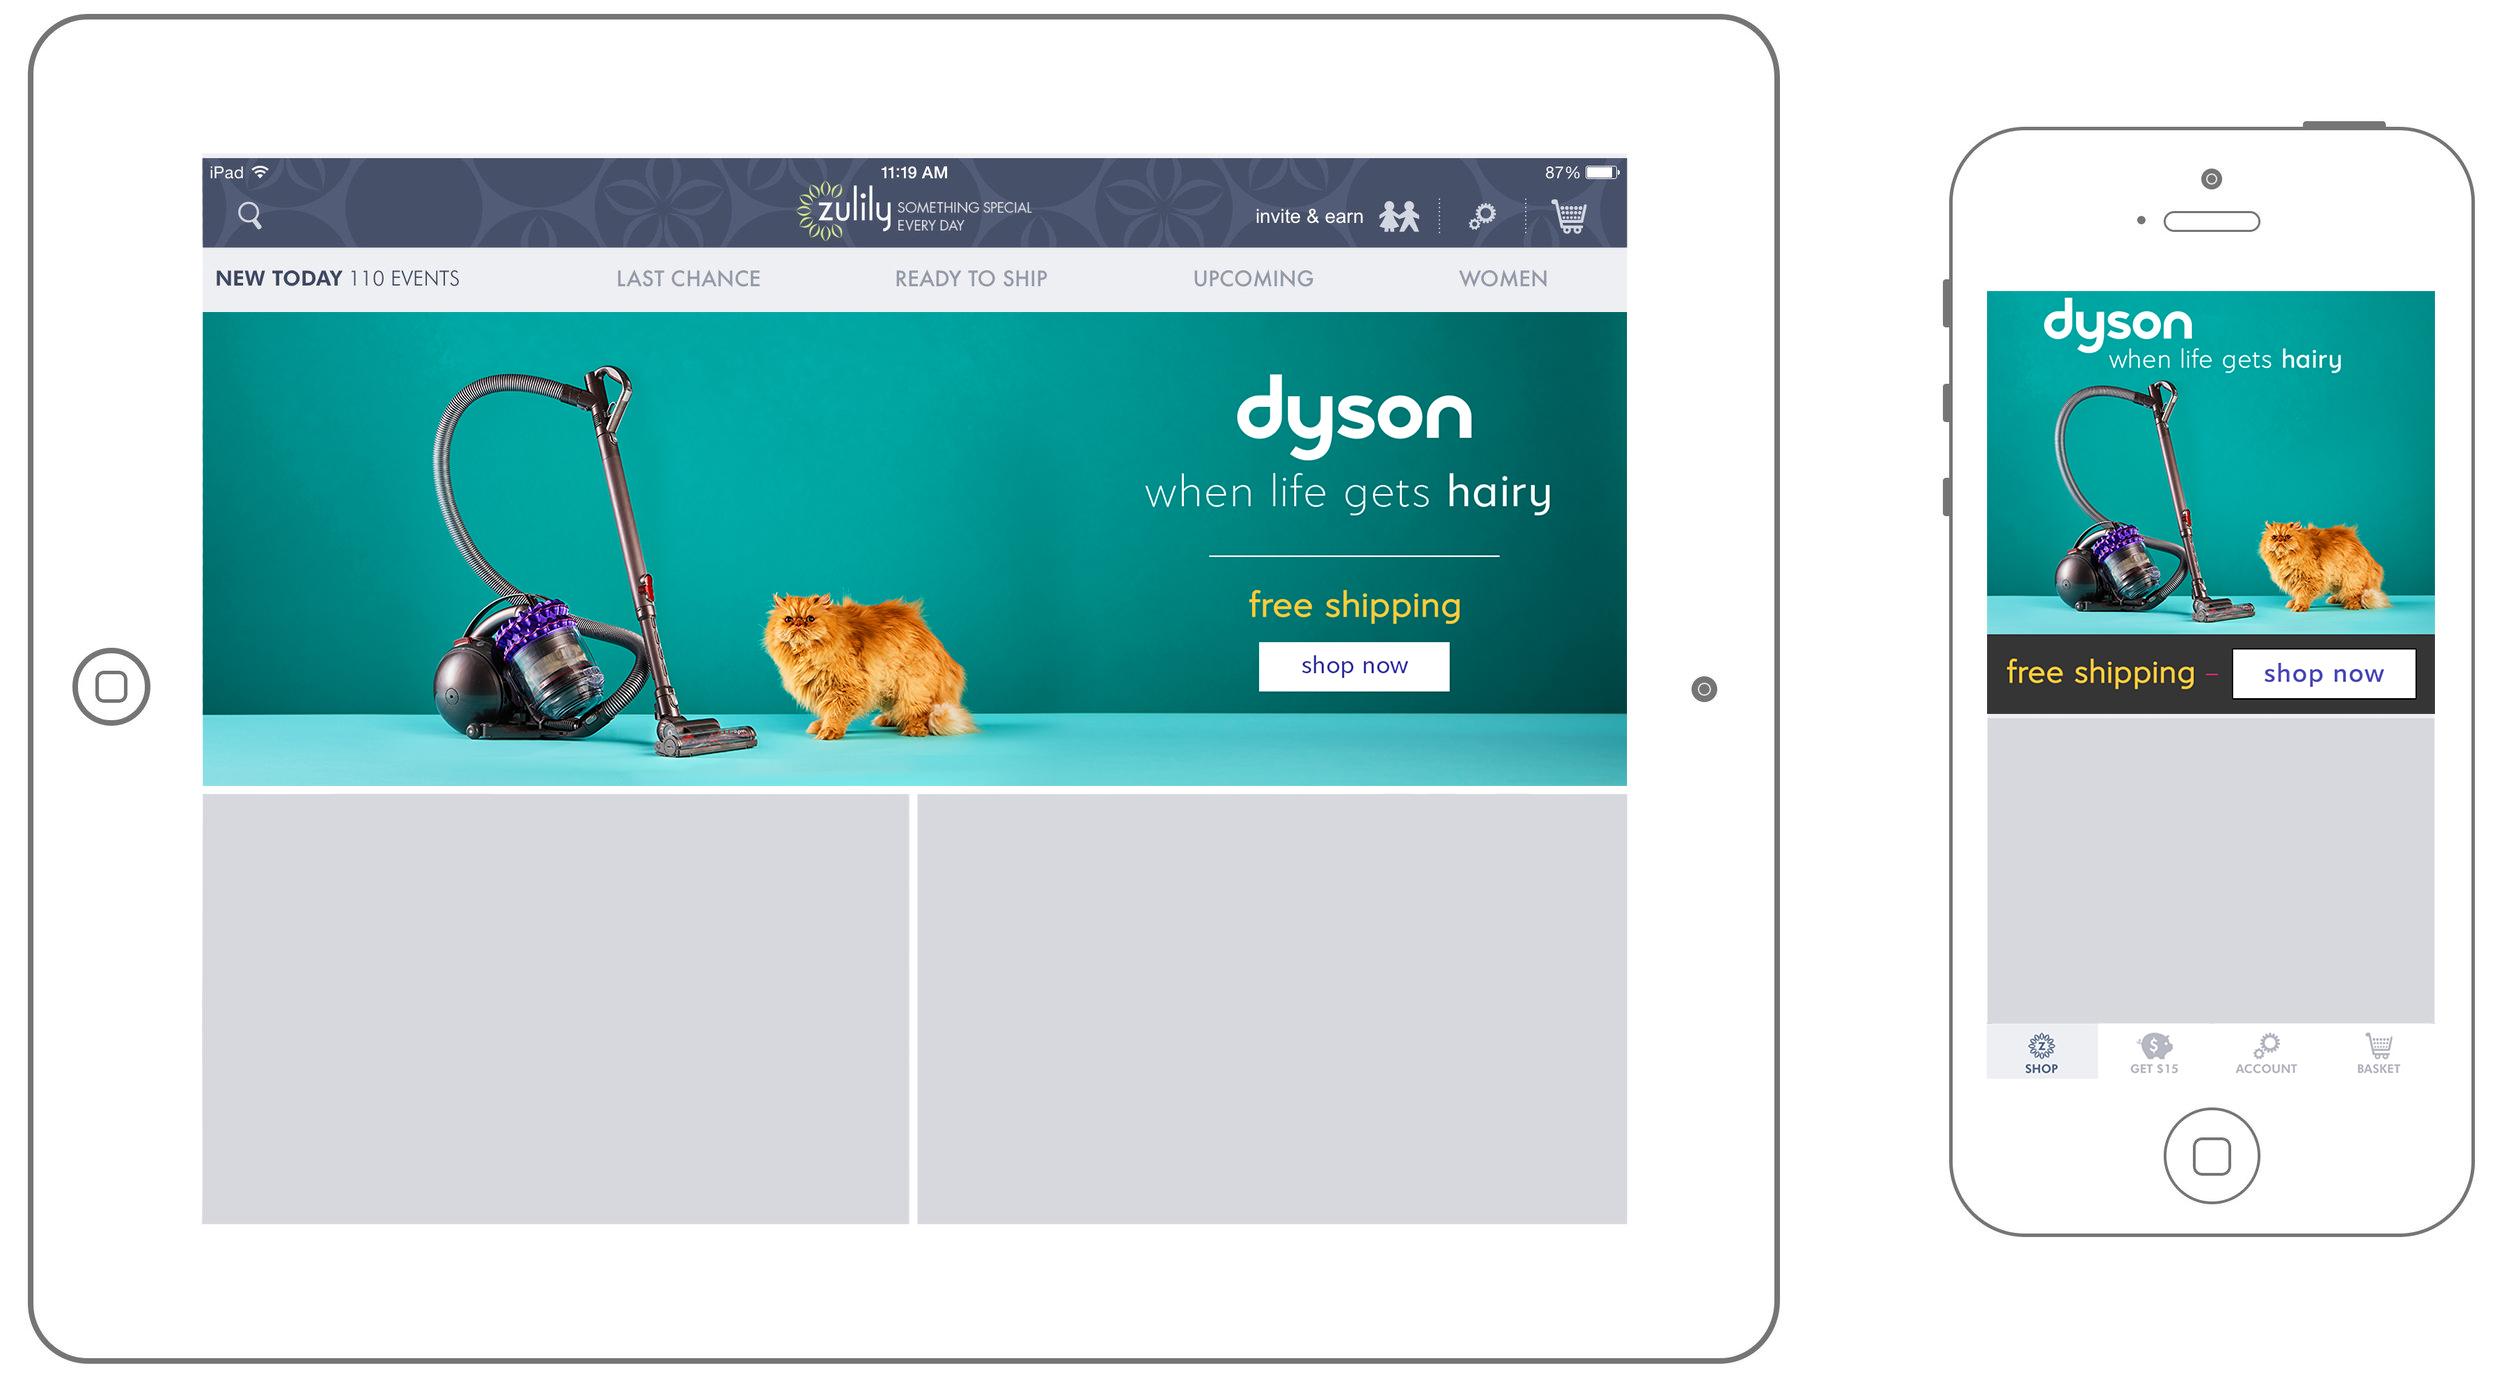 Dyson2018.jpg